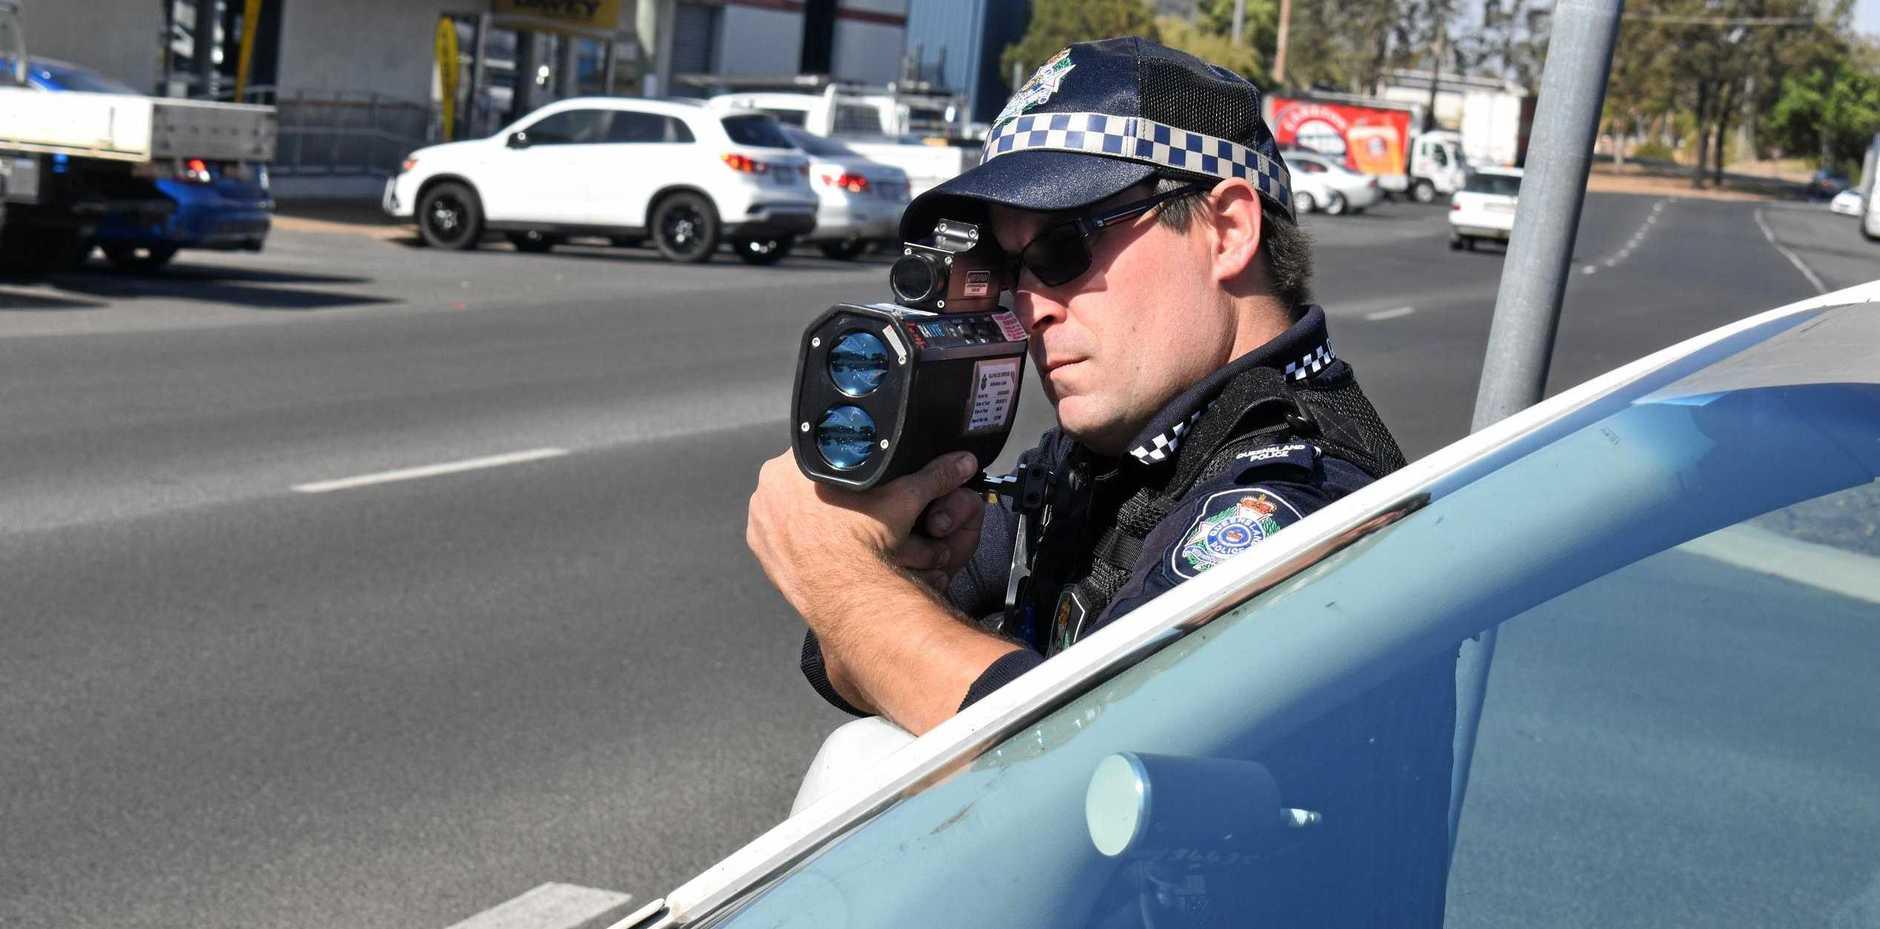 Senior Constable Matt Reichstein takes aim at speeding drivers